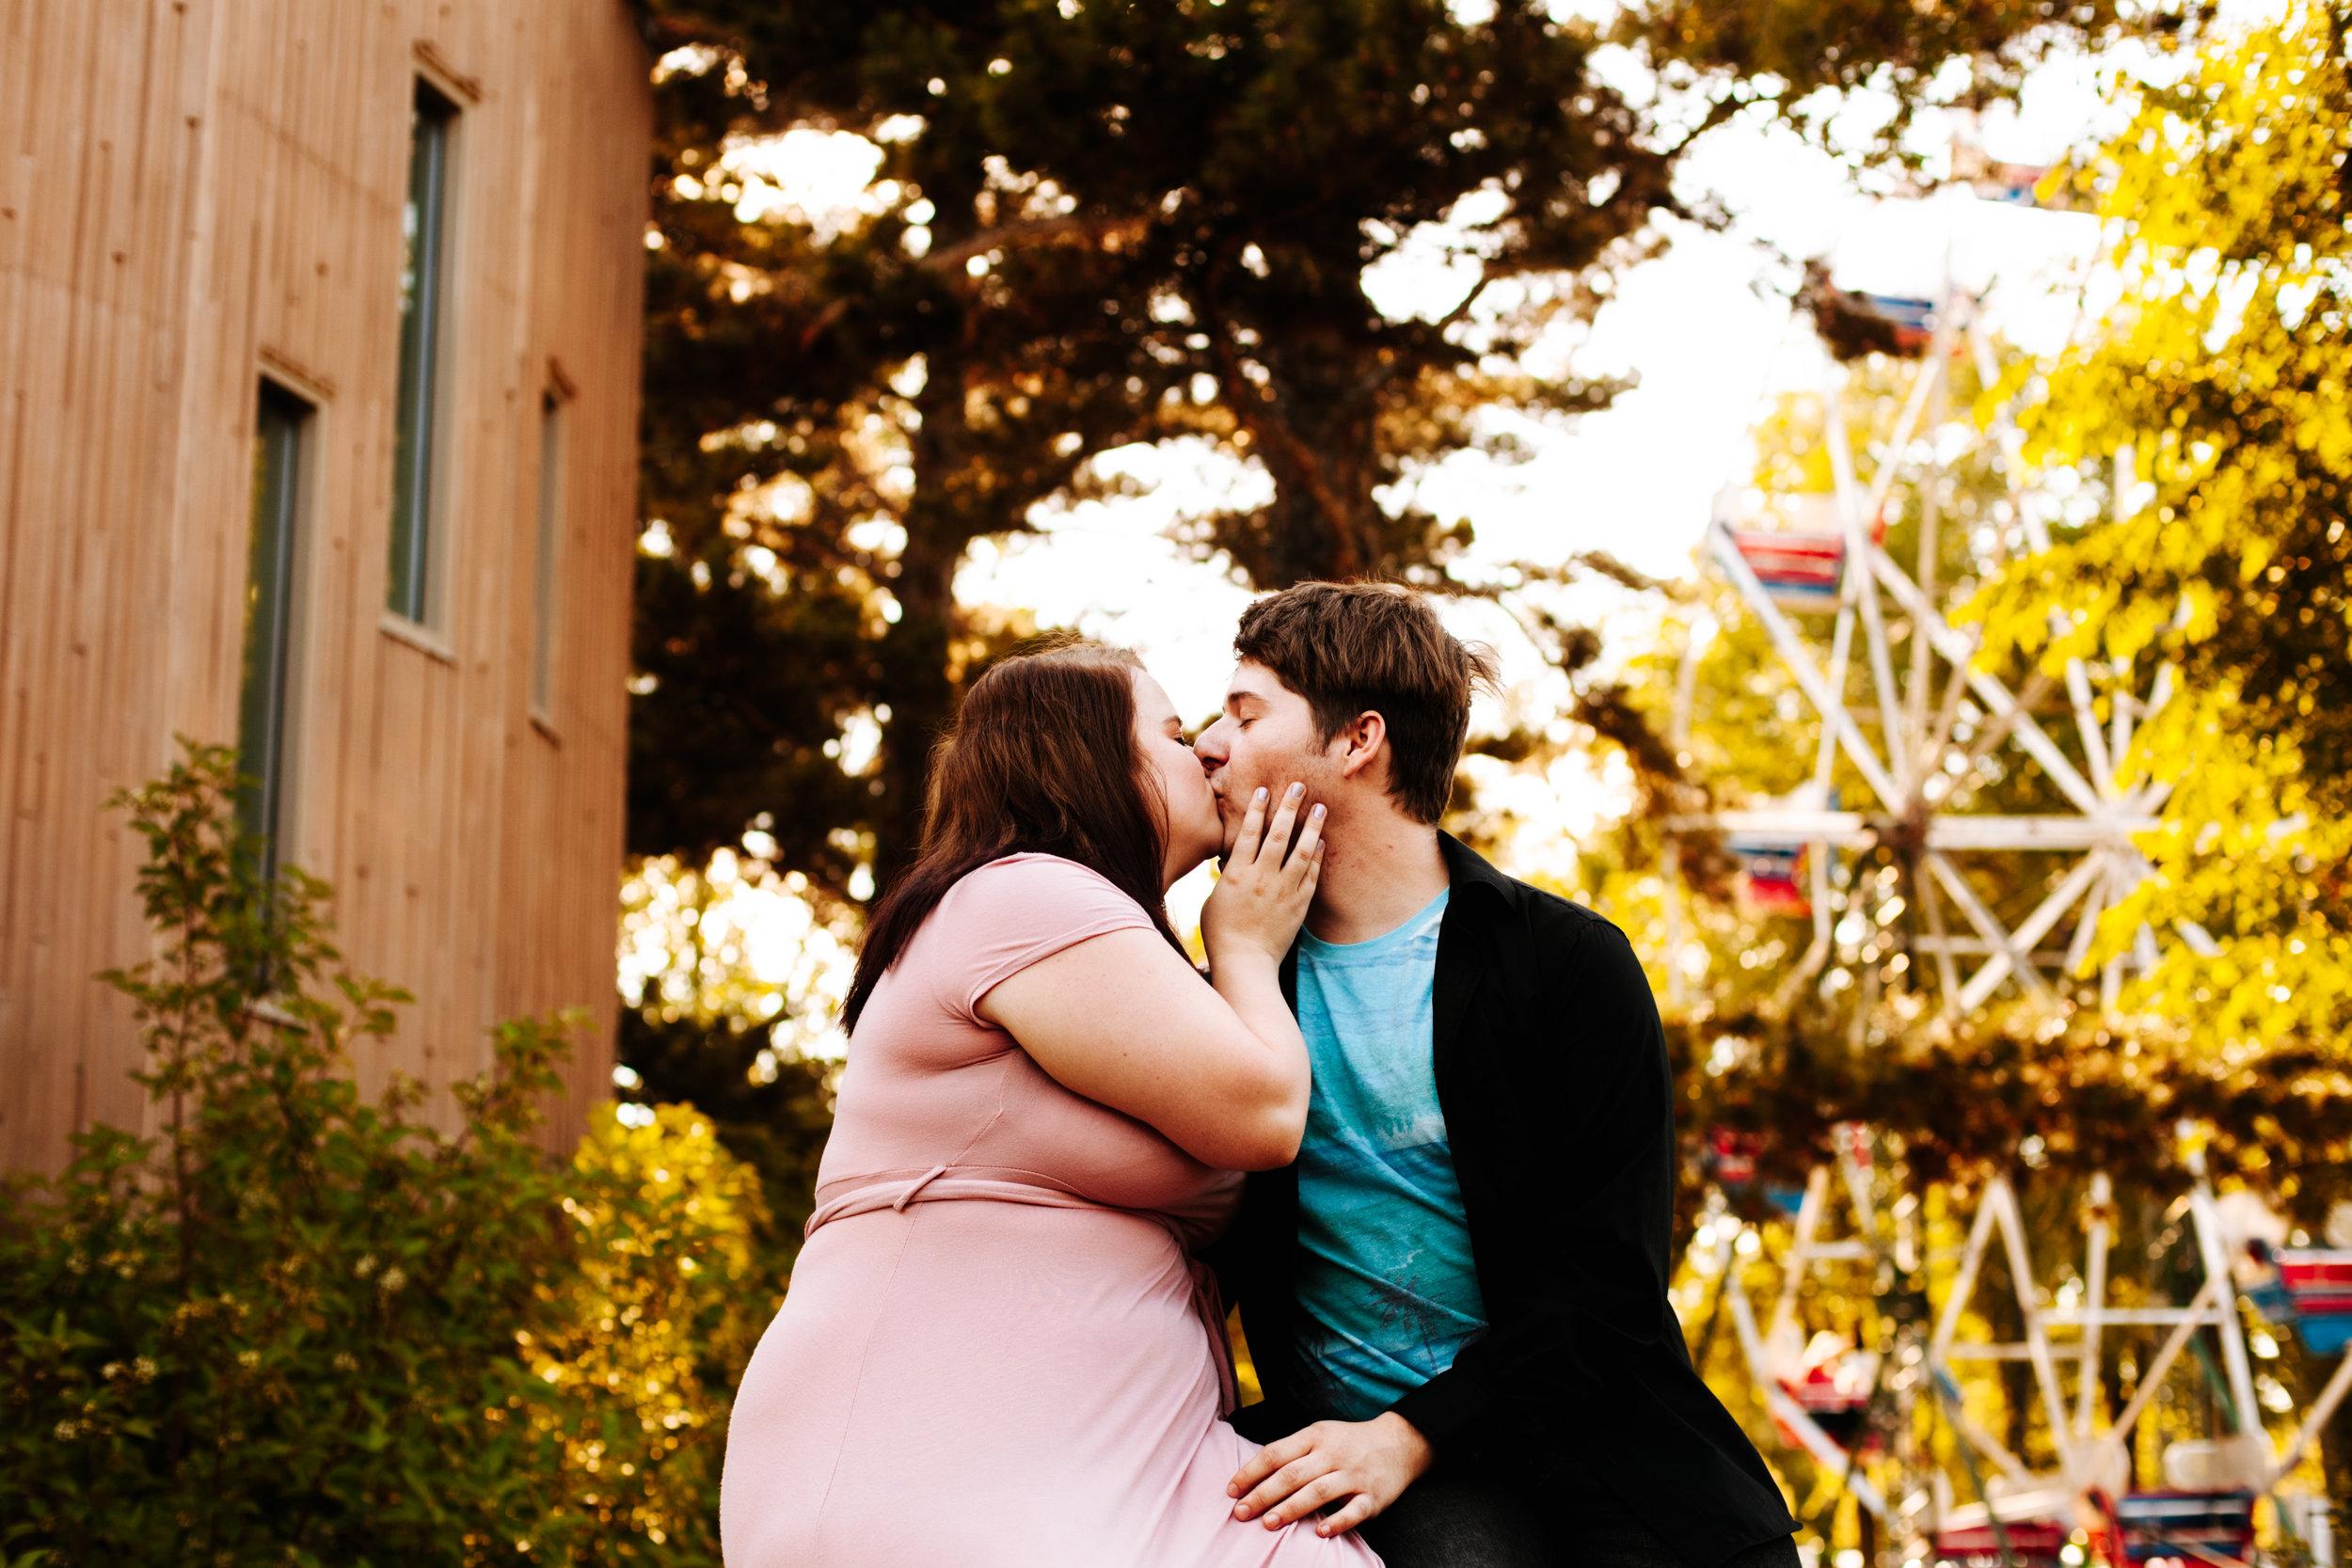 +Liberty Park +Utah Engagement Session +Salt Lake City Engagement Photographer +Utah Wedding Photographer +Marina Rey Photo-9802.jpg